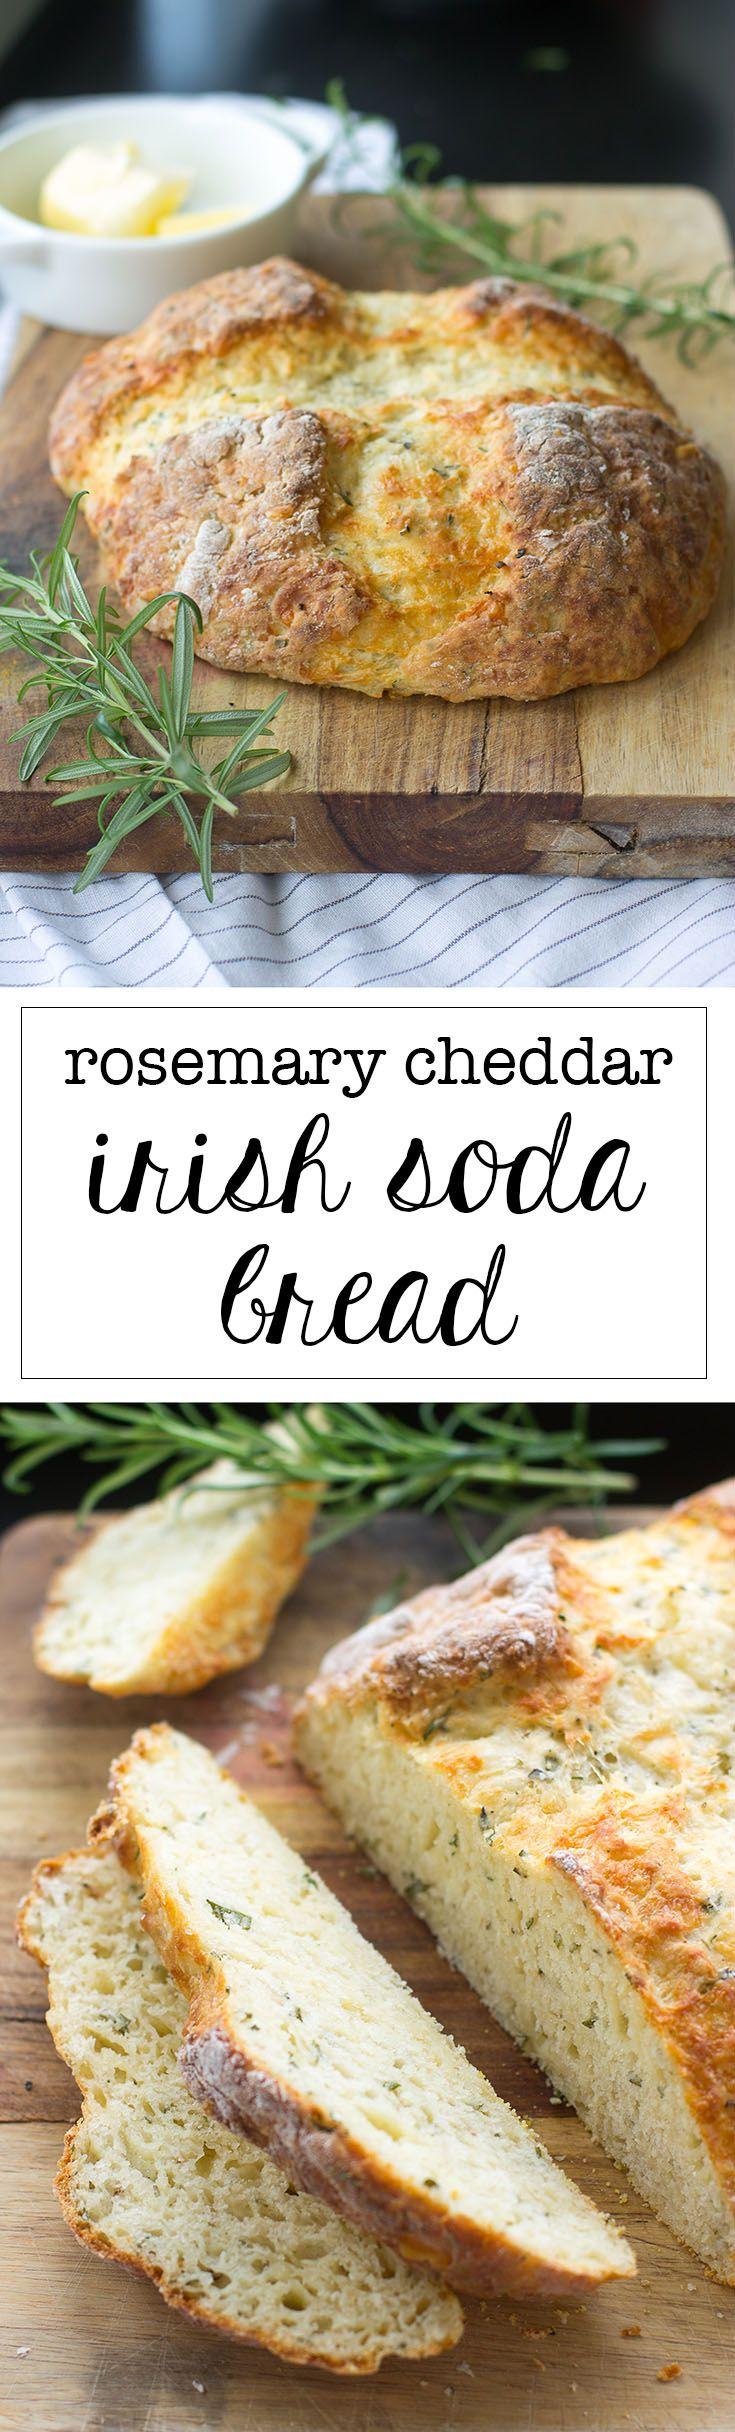 Rosemary cheddar Irish Soda Bread. #St_Patricks_Day #breads